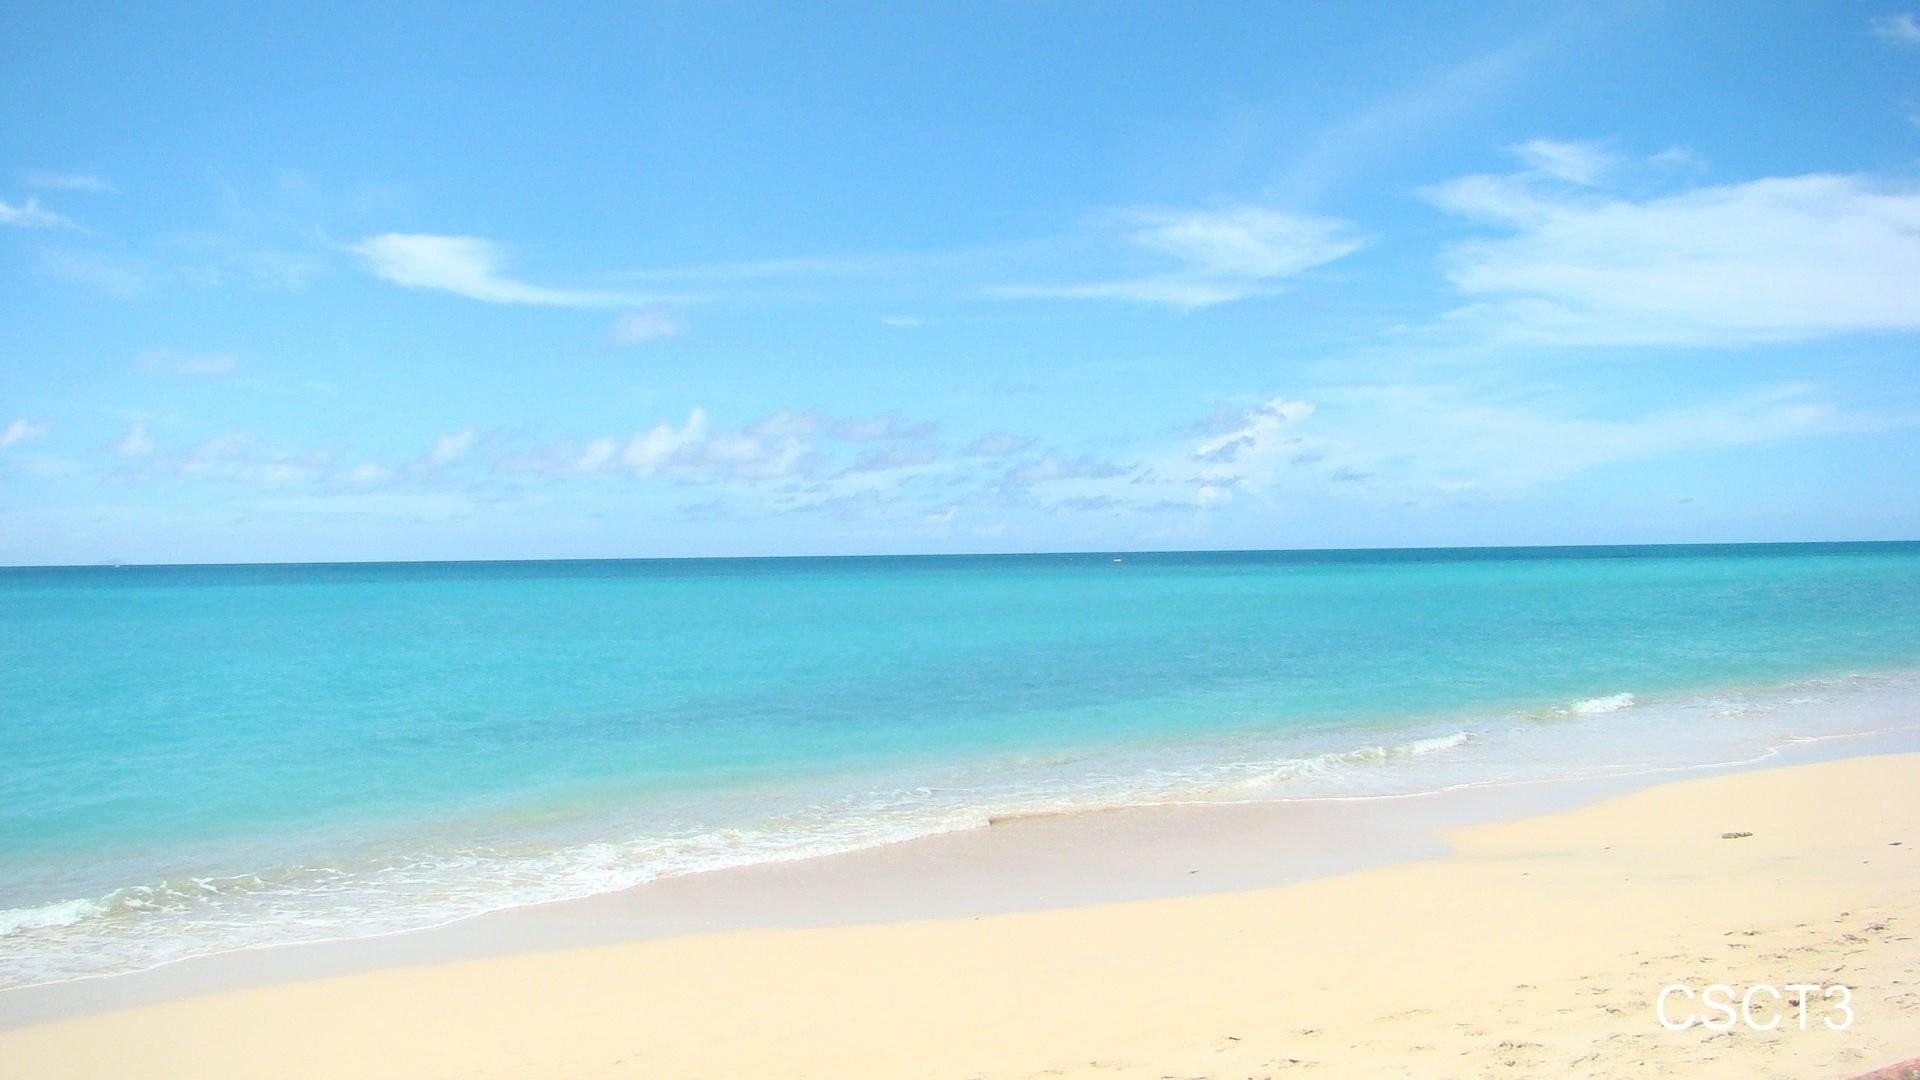 caribbean sand beach wallpaper